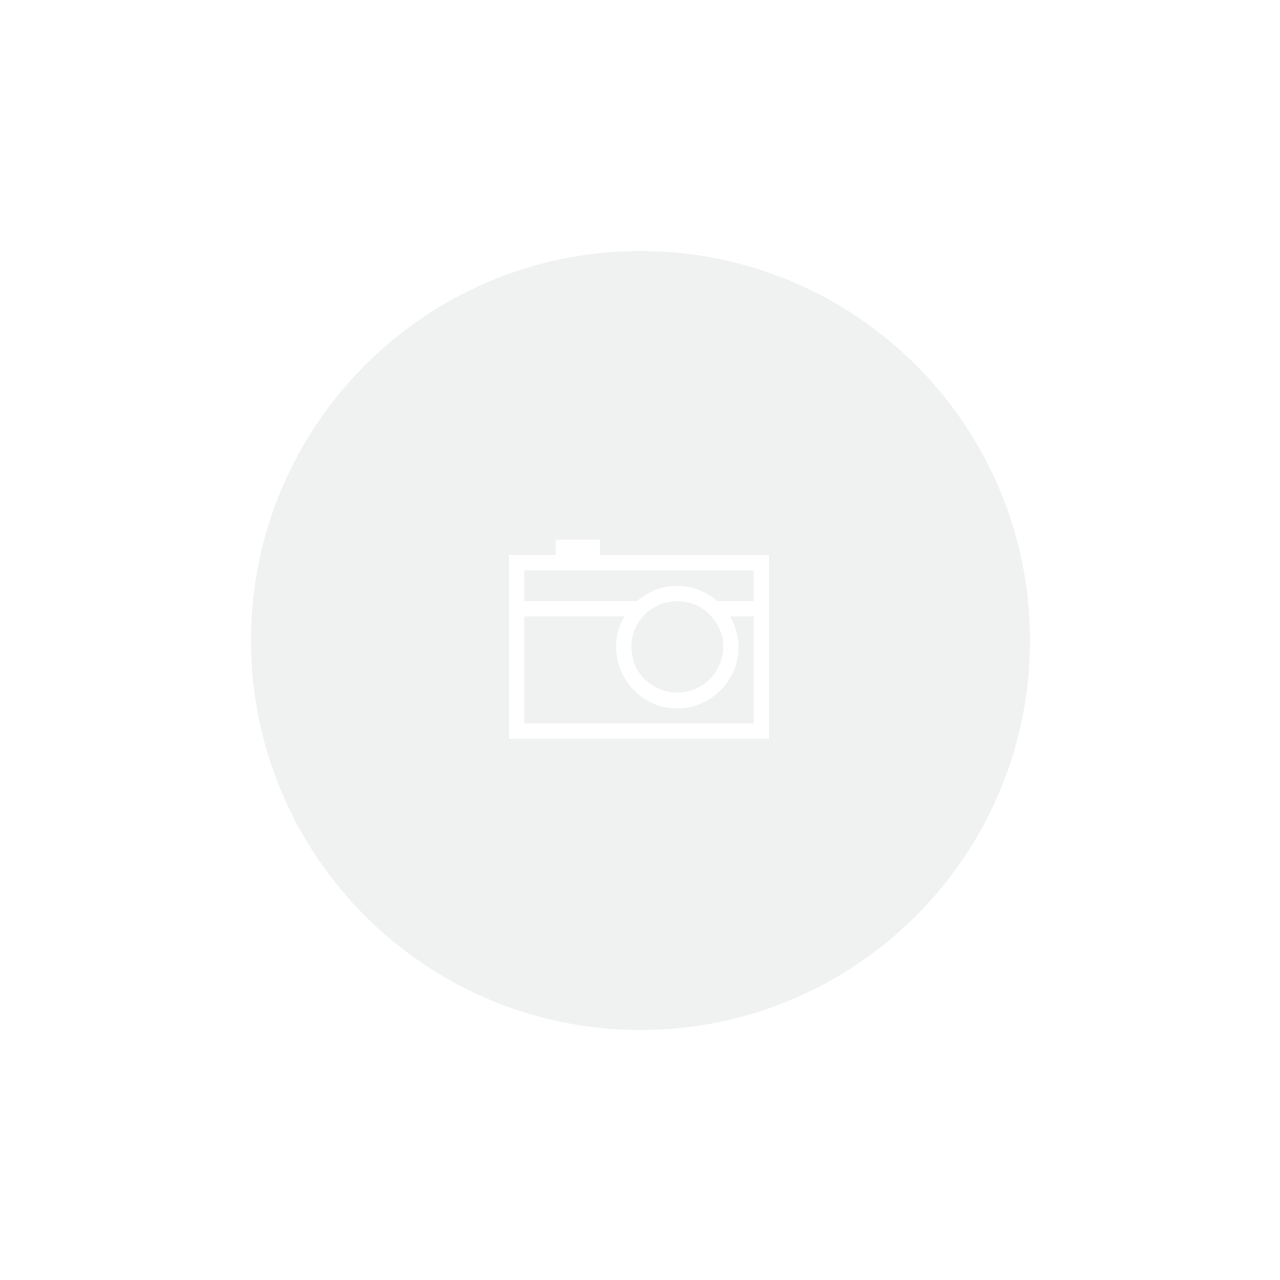 Bomboniere Vidro Triangle 19,2x16,8x21,7cm Lyor